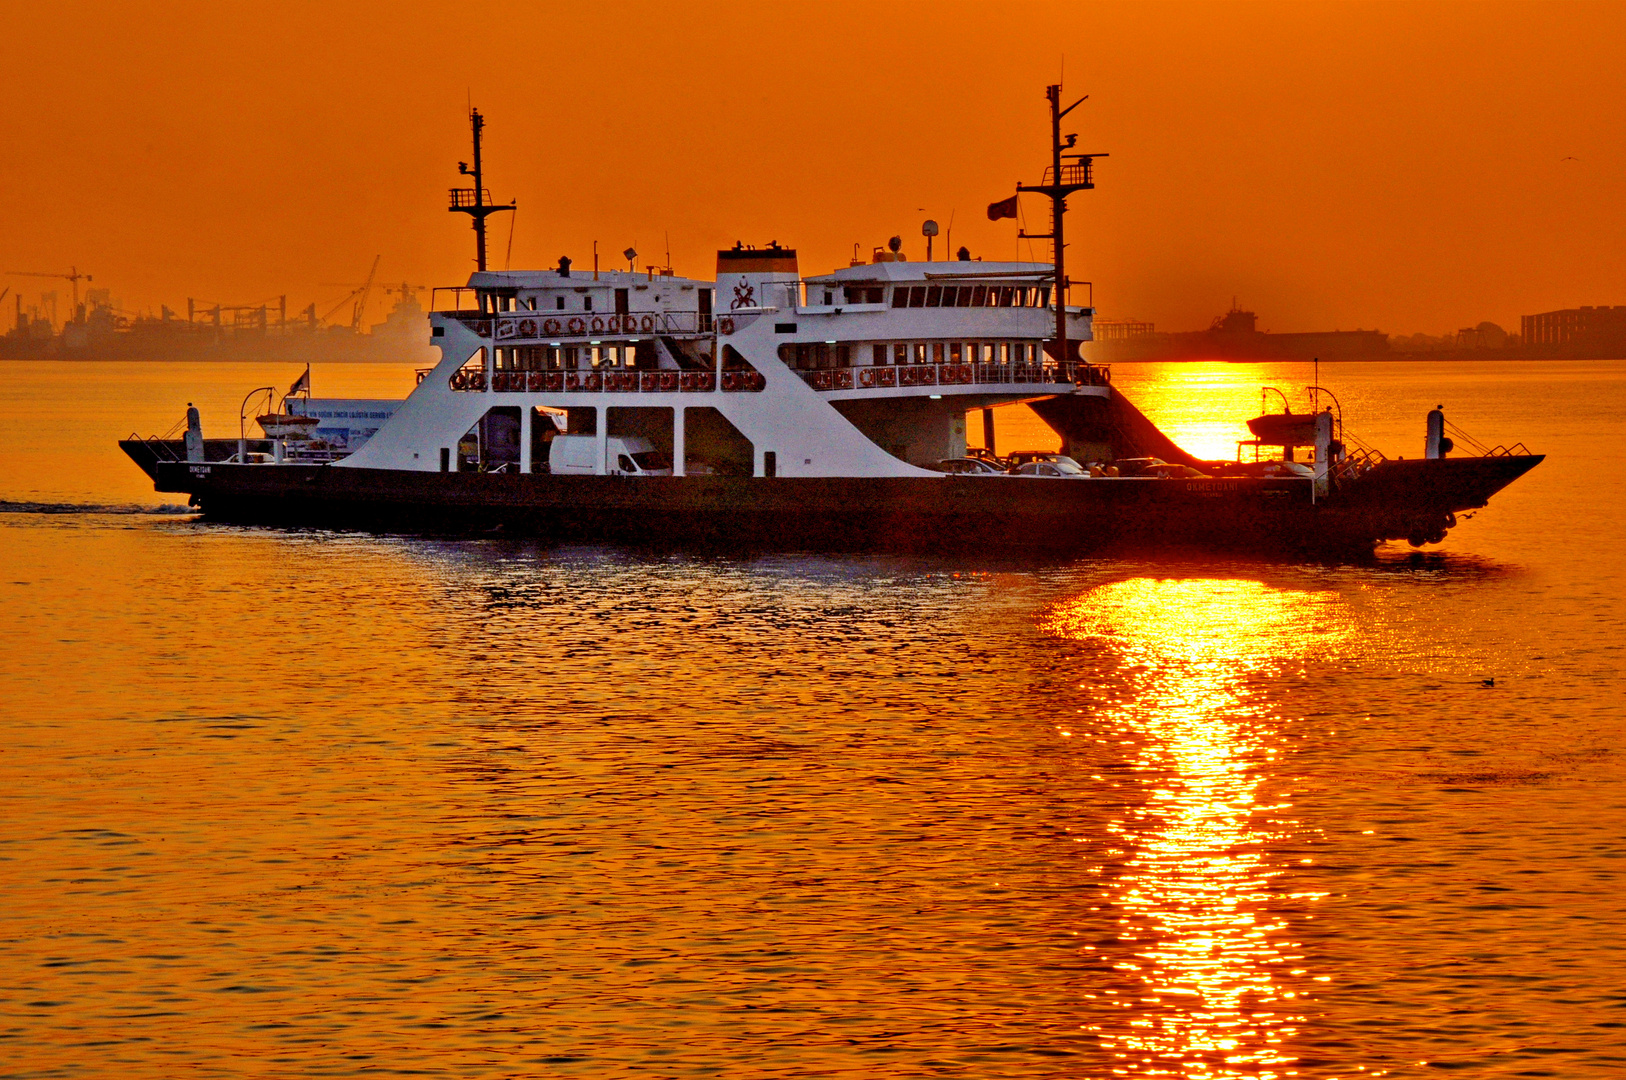 Sonnenuntergang, Gebze Türkei I